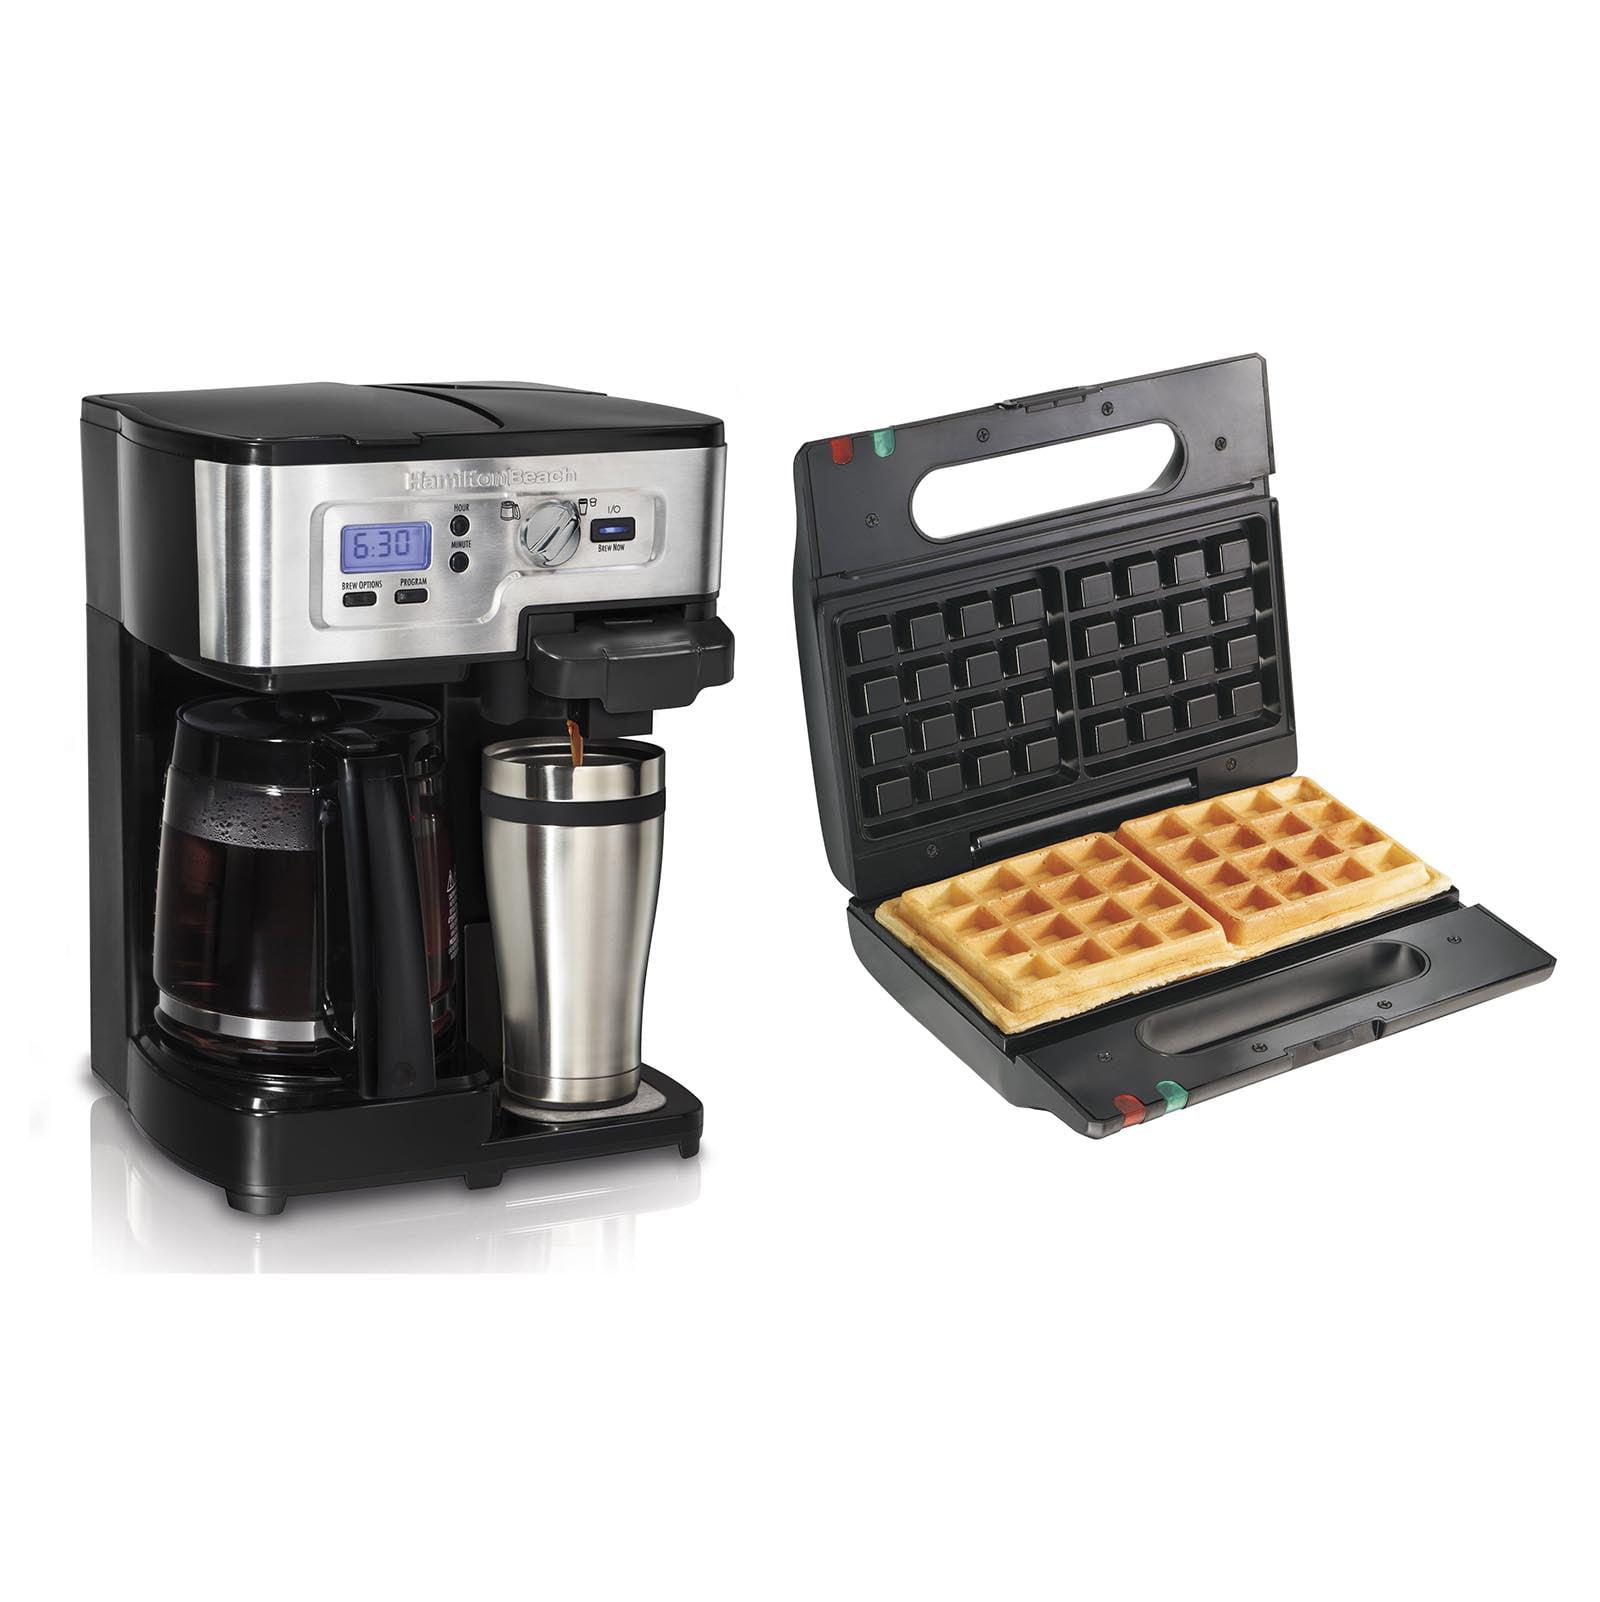 Hamilton Beach FlexBrew 12 Cup Coffee Maker + Proctor-Sil...